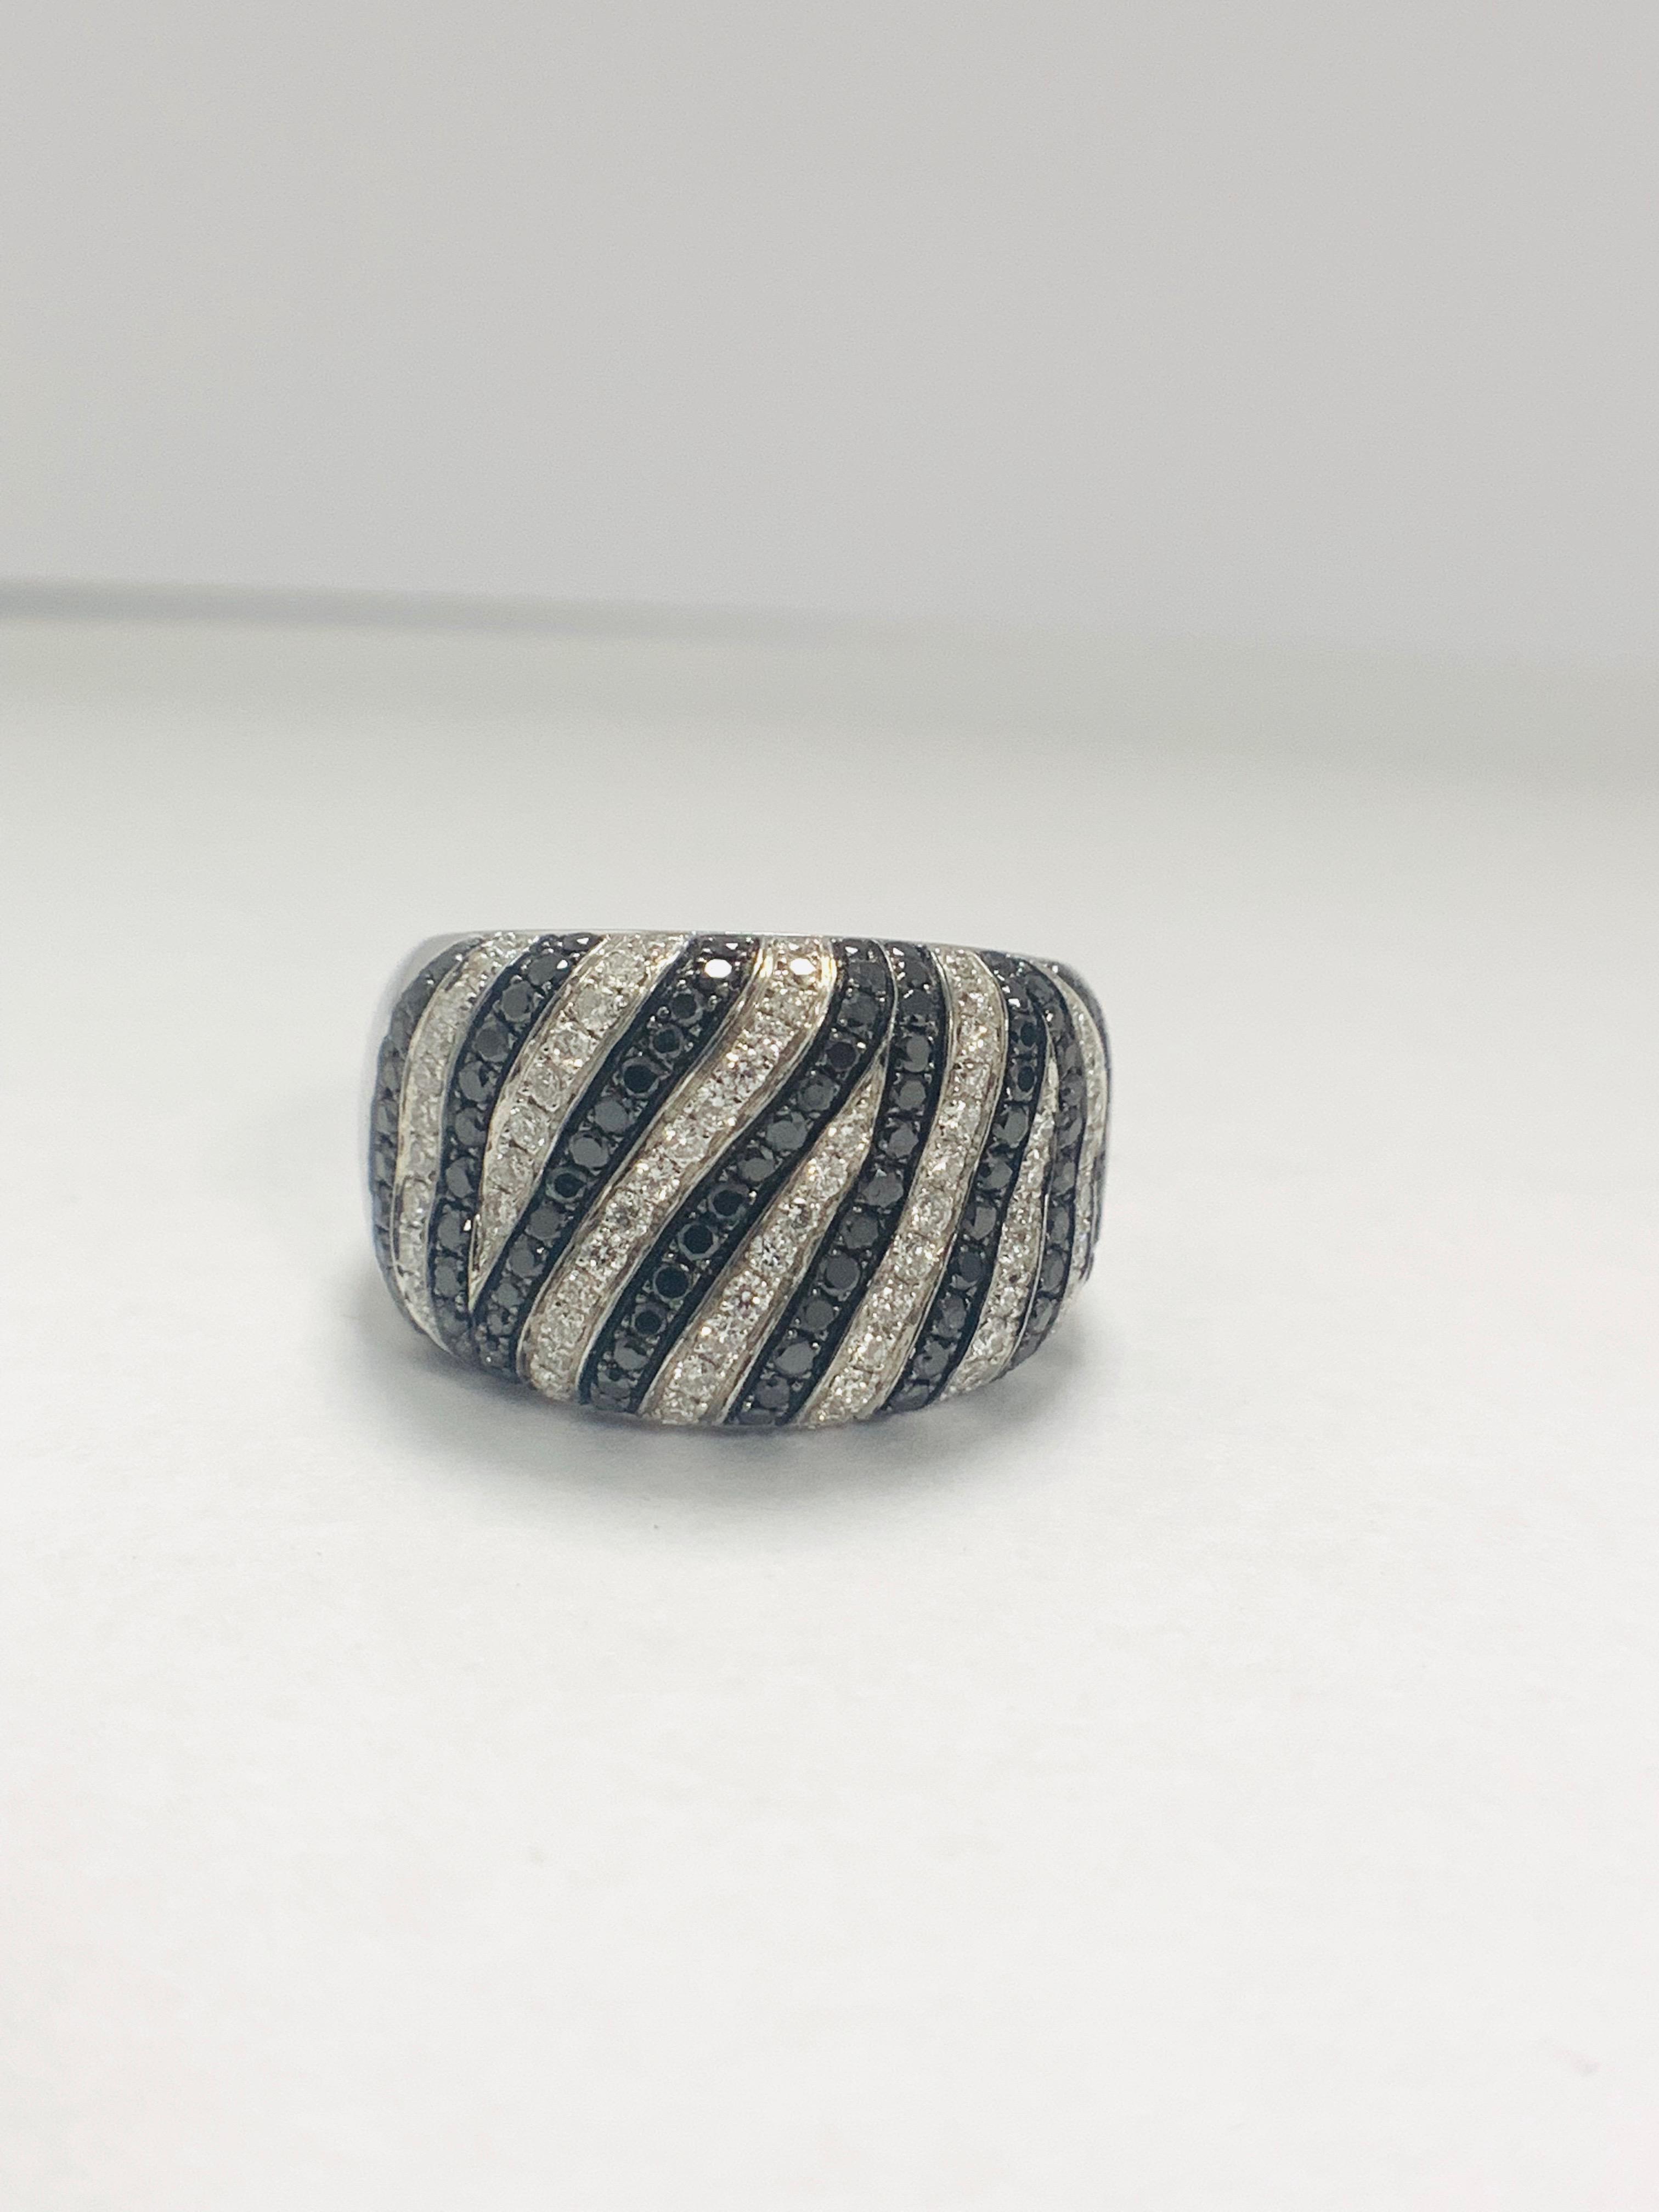 18ct White Gold Diamond ring - Image 9 of 14